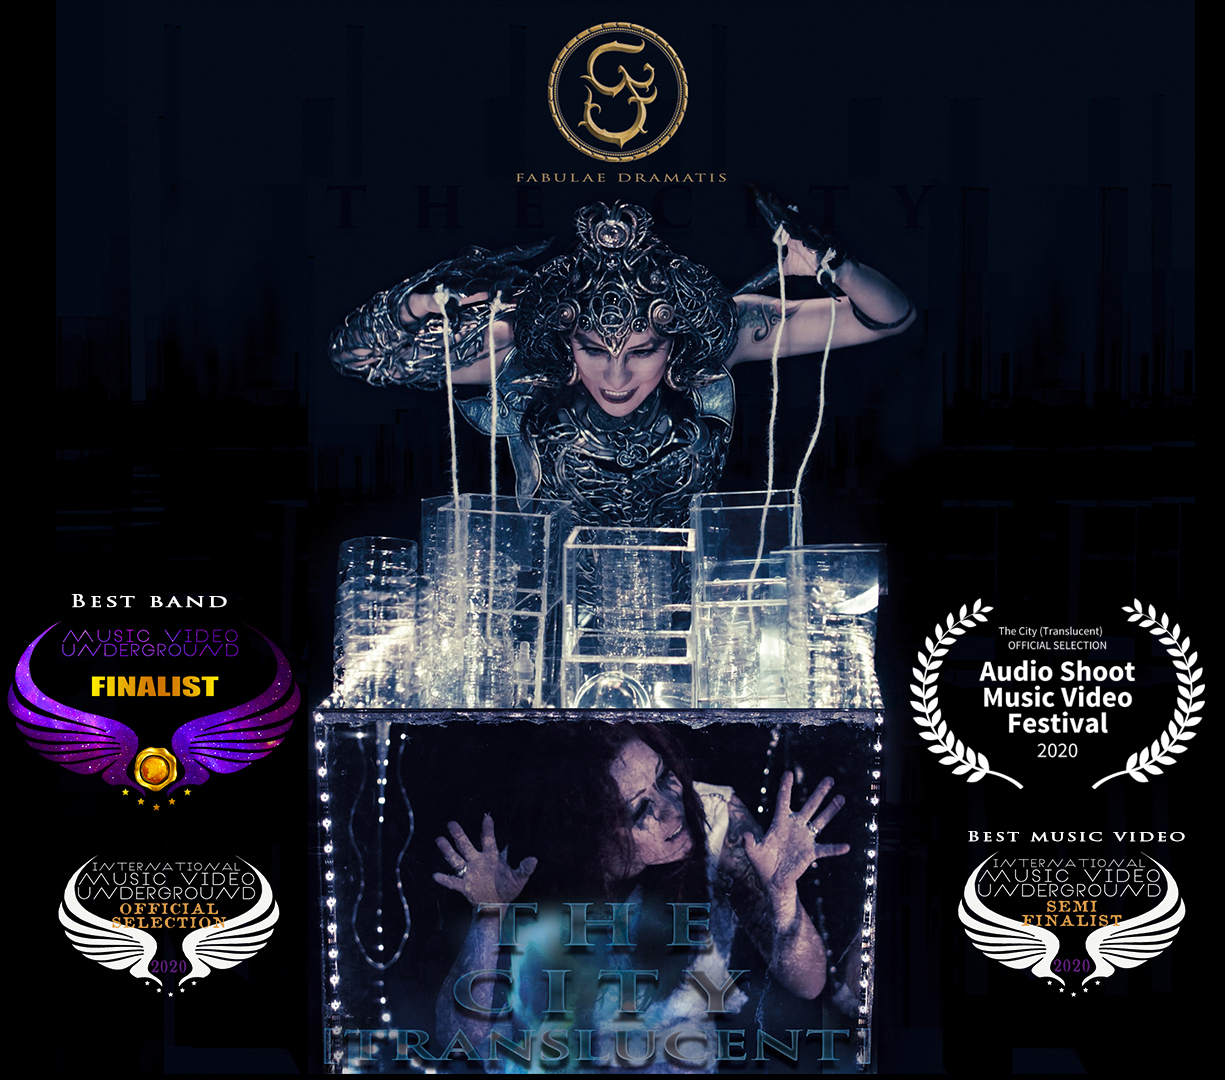 Audio Shoot Music Video & Film Festival